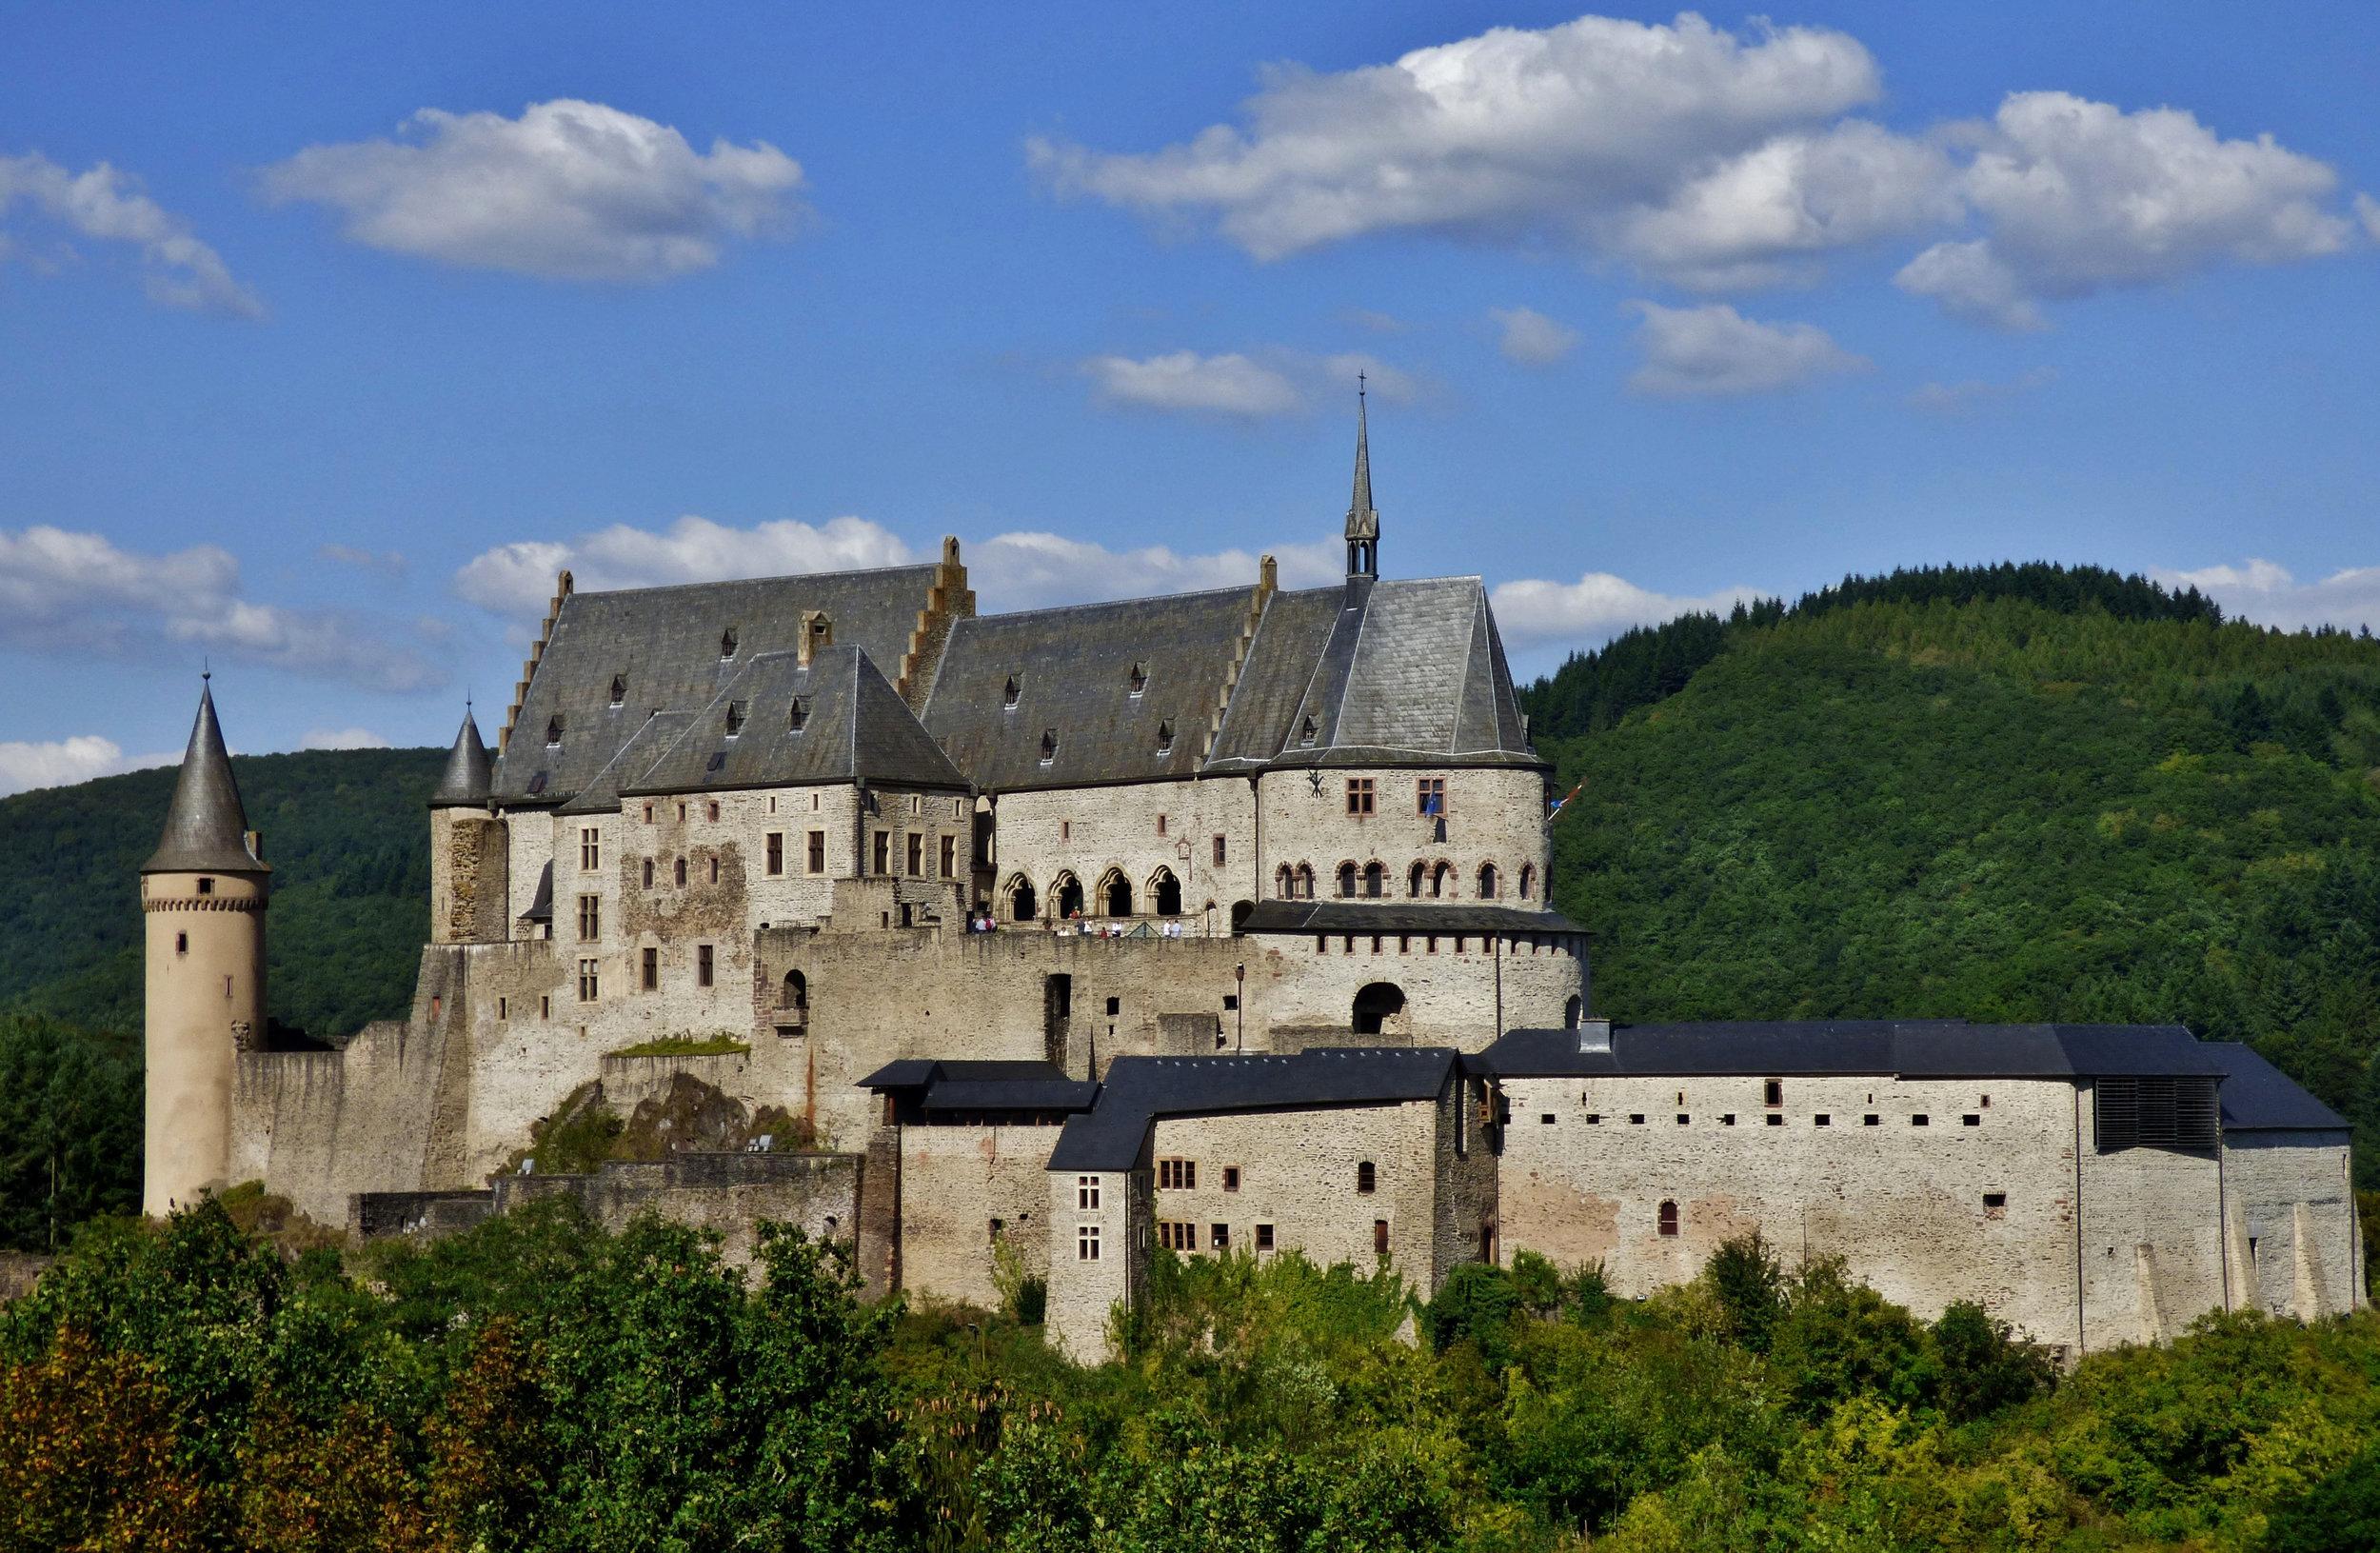 castle-bourscheid-4177820 (2).jpg